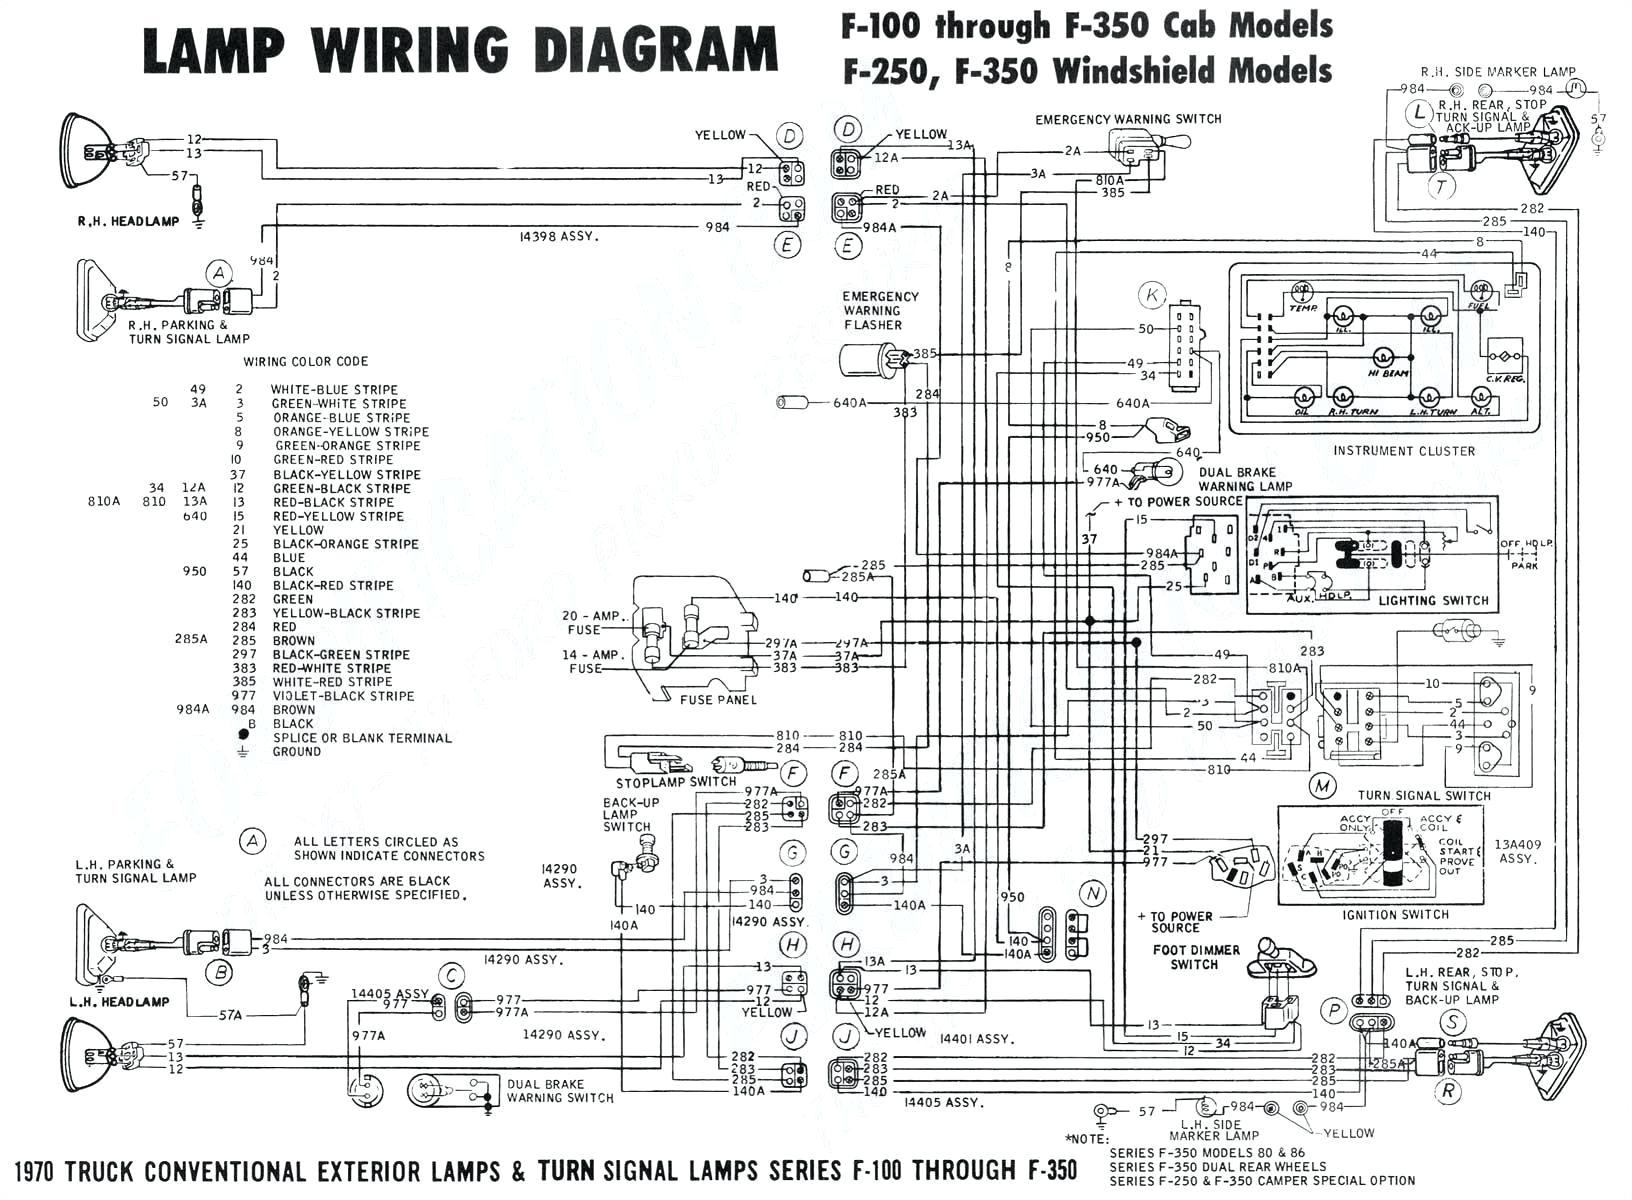 og phone wiring diagram wiring diagram wiring diagram 4 wire og signal